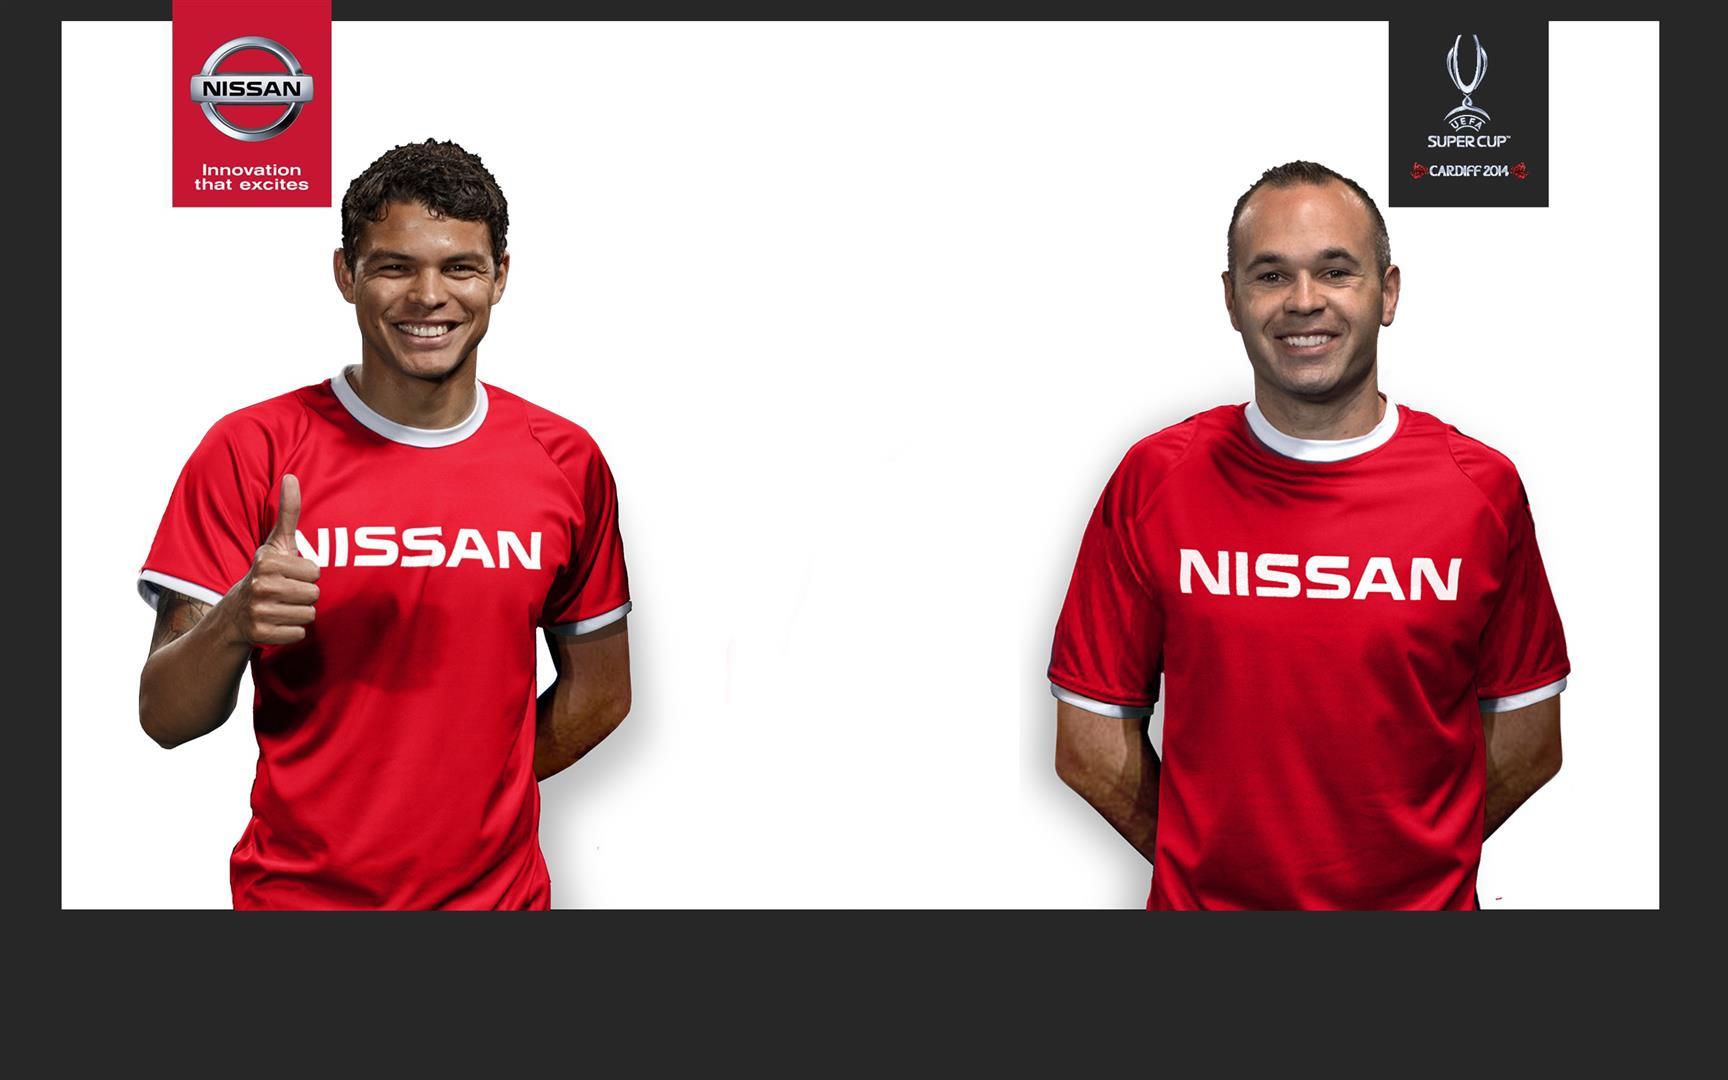 Nissan UEFA ambassadors